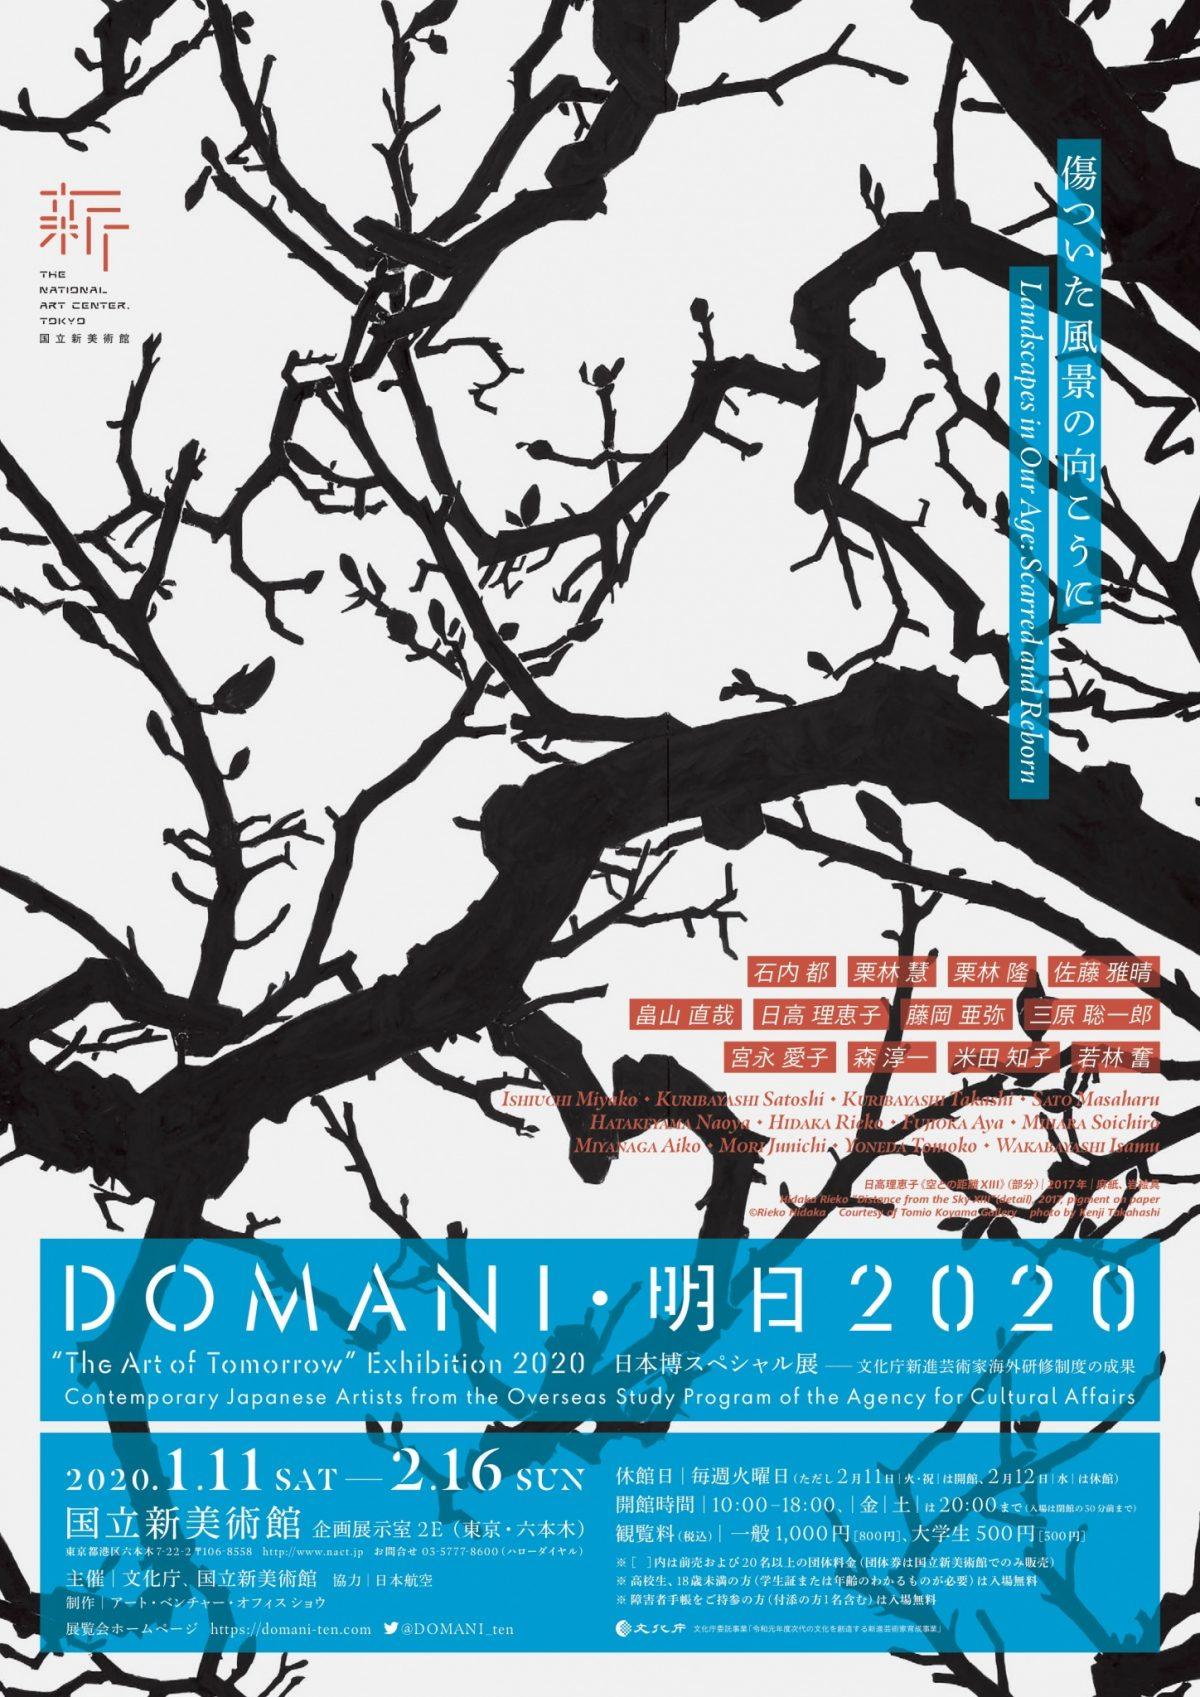 DOMANI・明日展|文化庁芸術家在外研修の成果